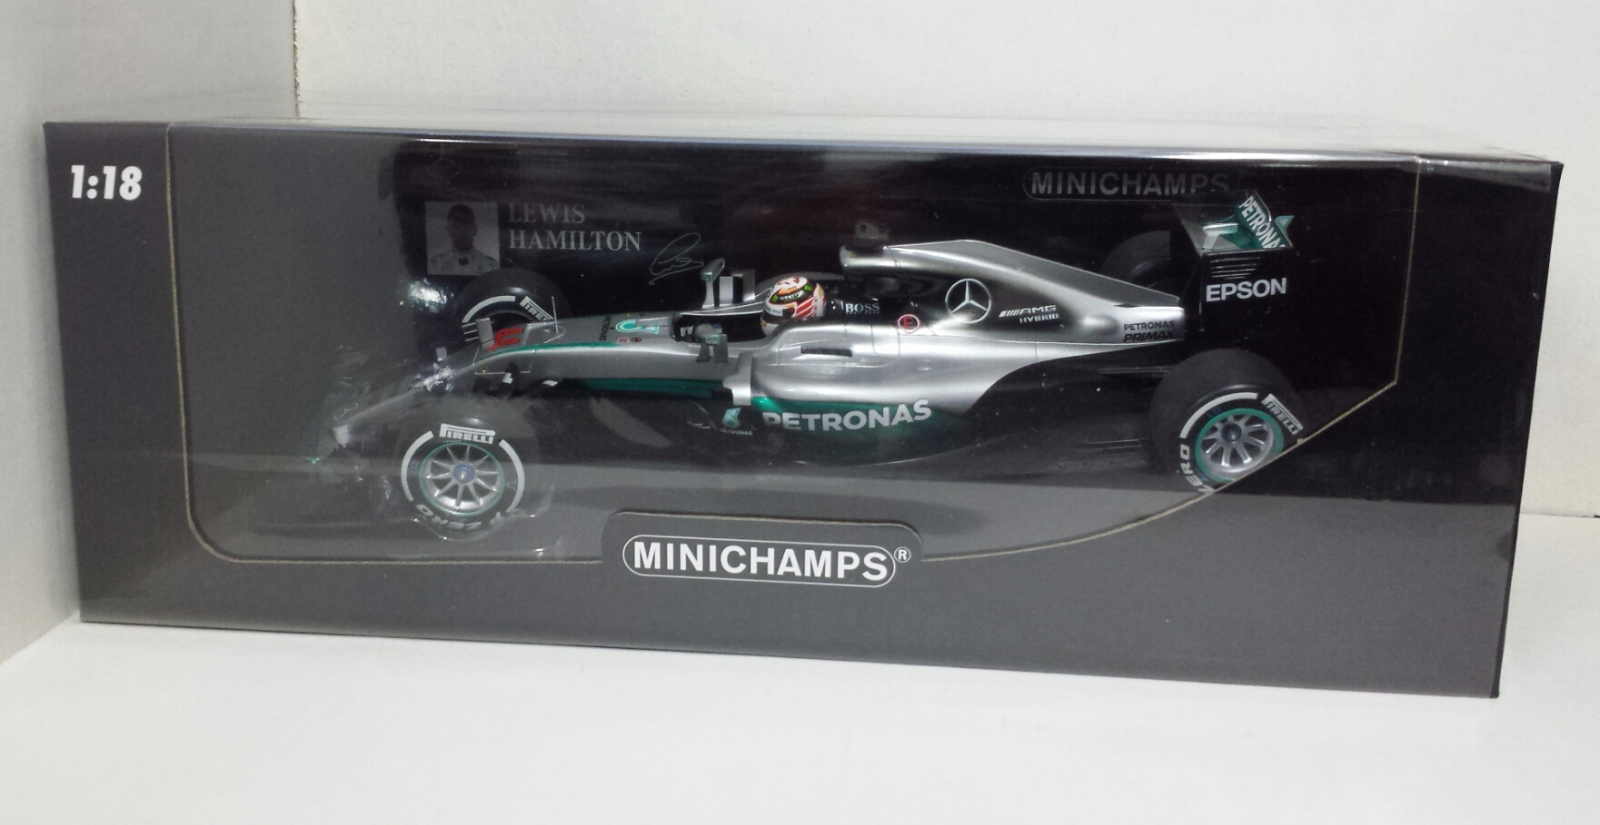 MINICHAMPS LEWIS HAMILTON 1 18 MODELLINO MERCEDES F1 W07 GP AUSTRALIA 2016 NEW